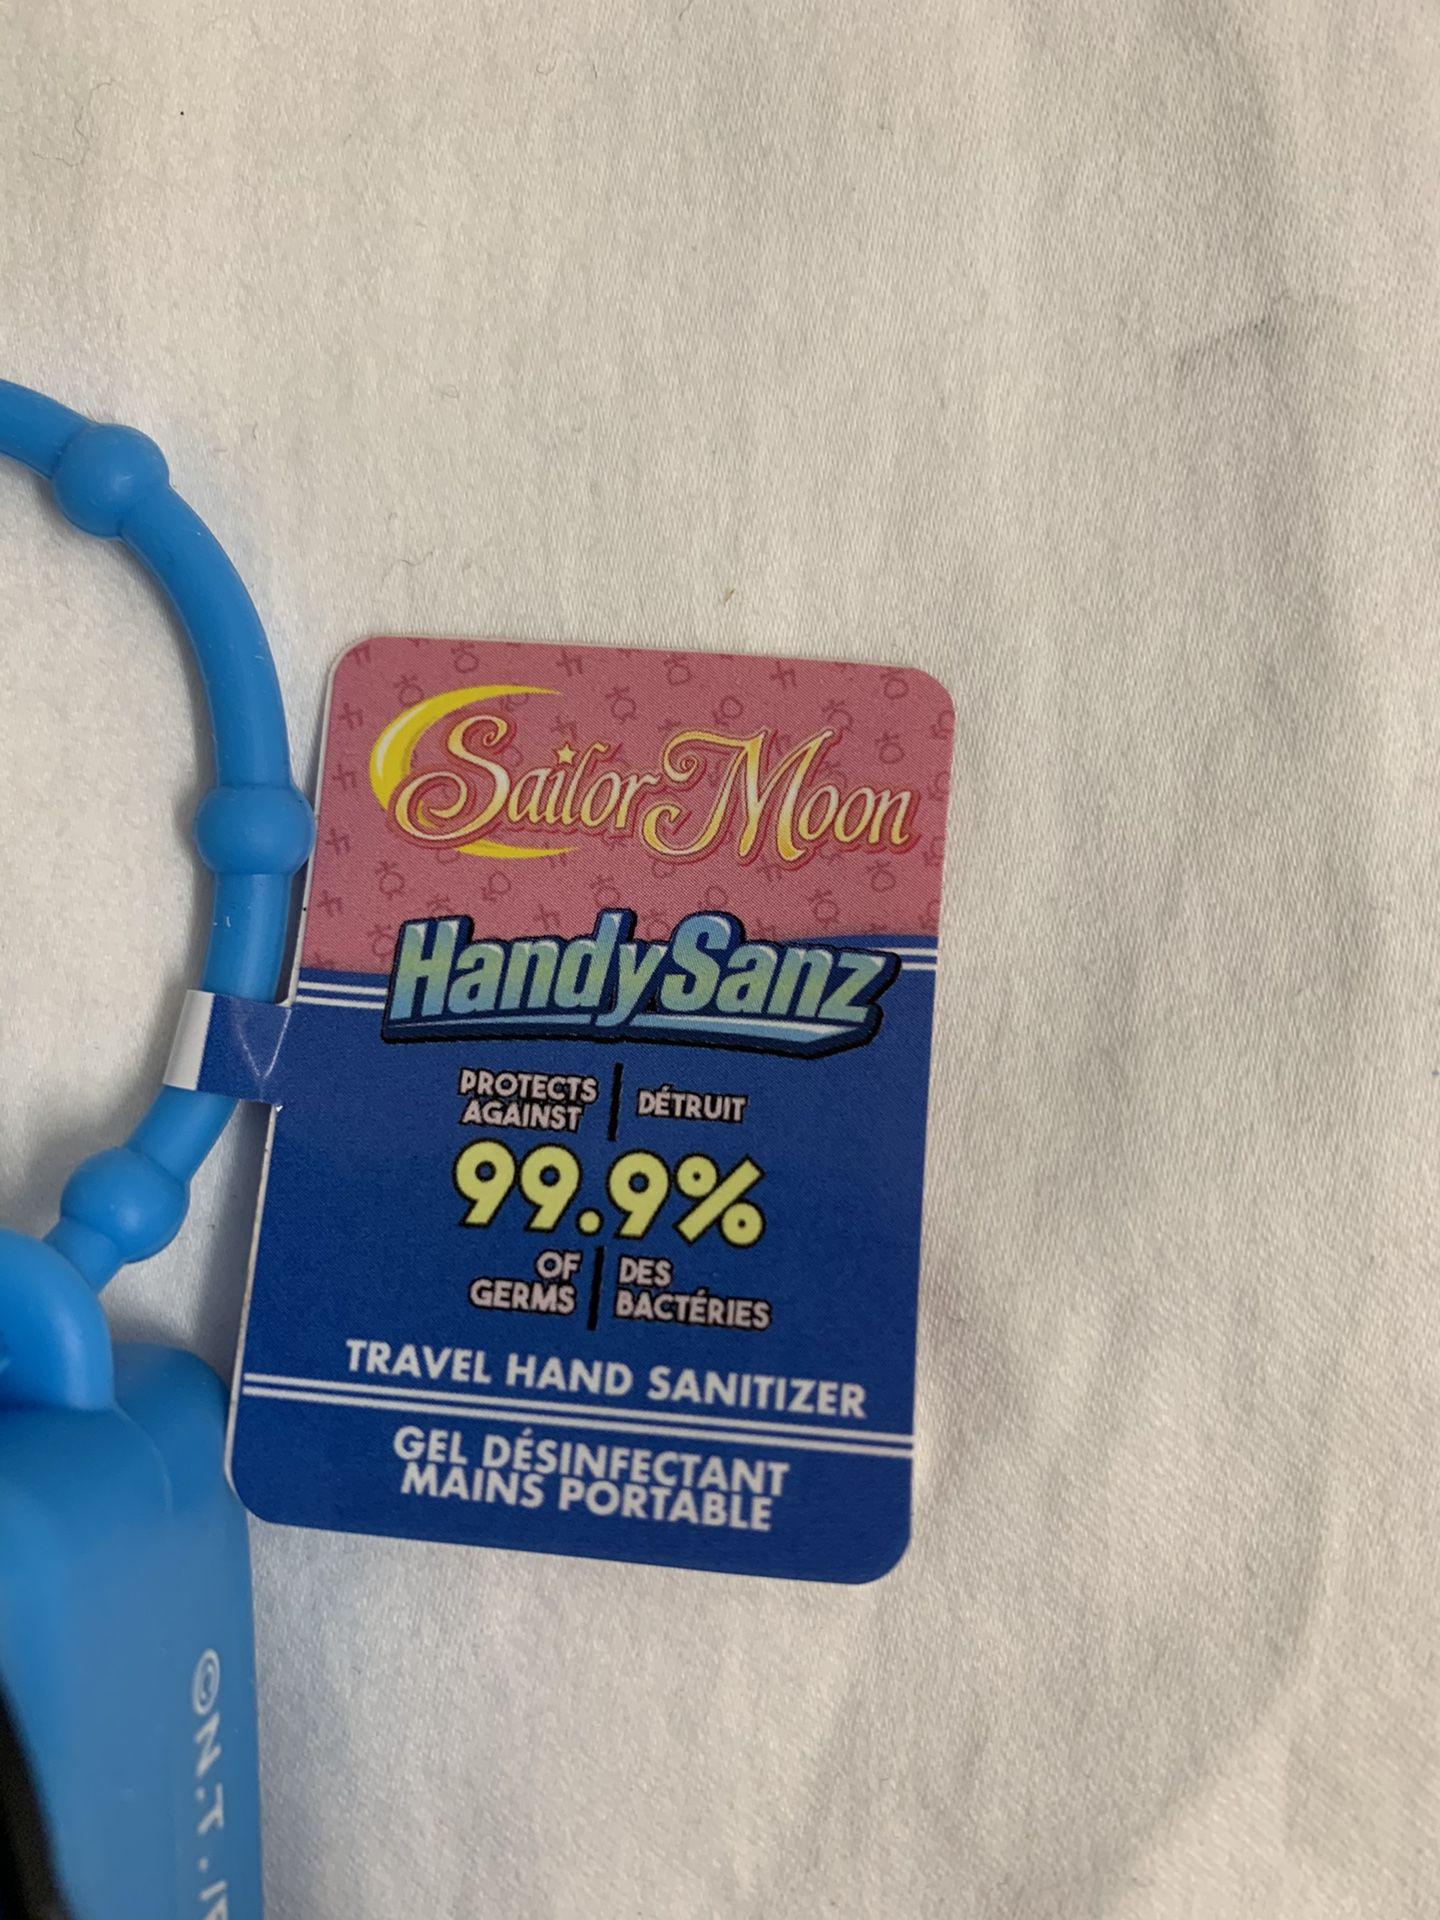 Sailor moon handysanz